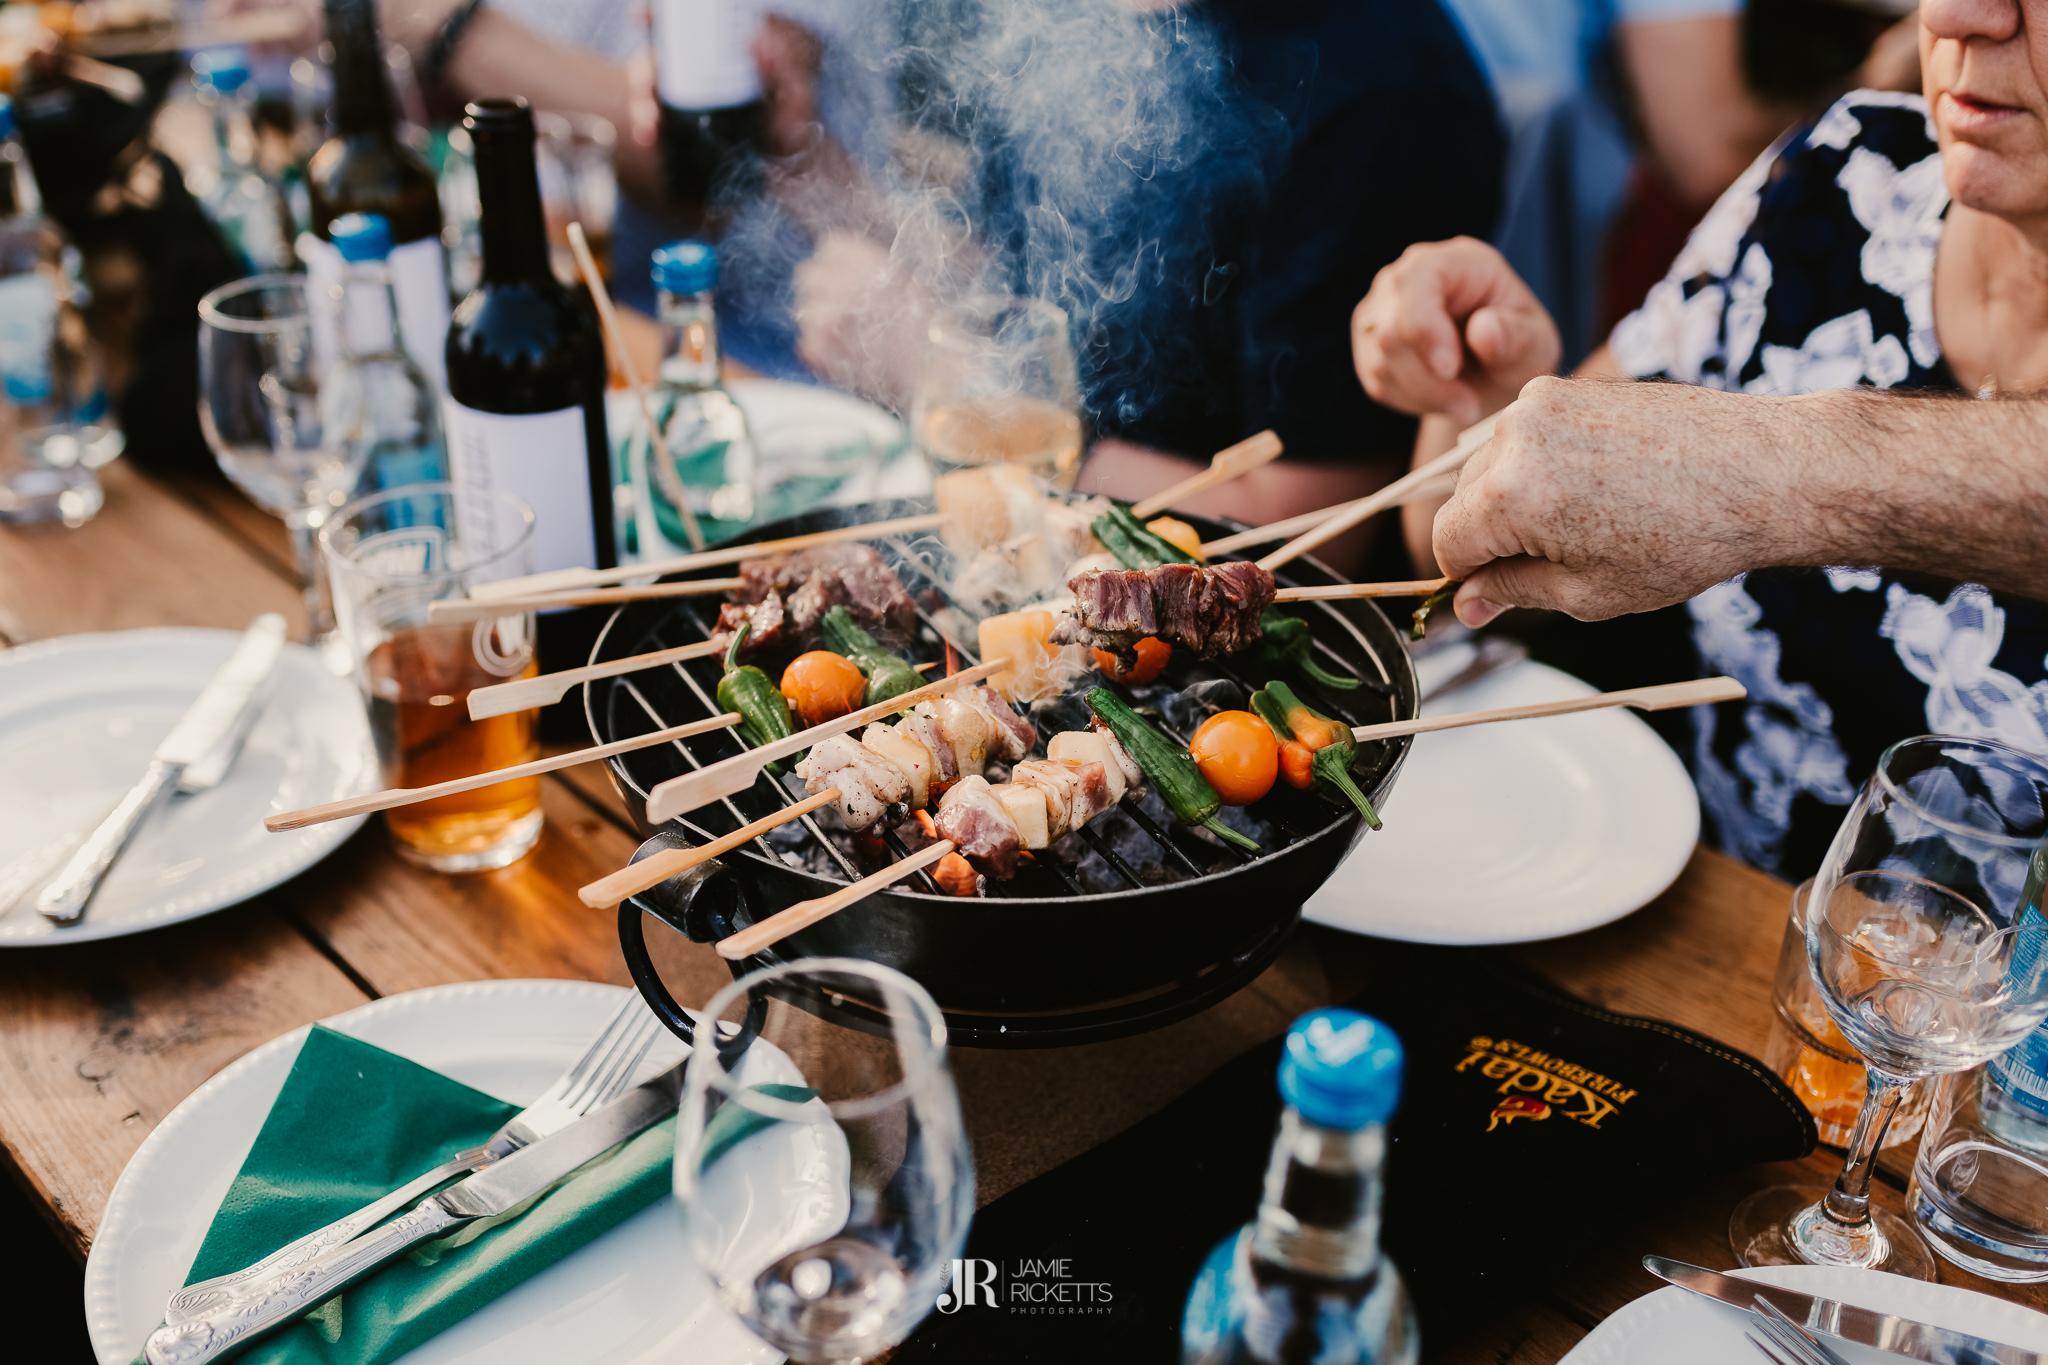 BBQ BANQUET NIGHT-28.06.2019-JR-SM-34.JPG